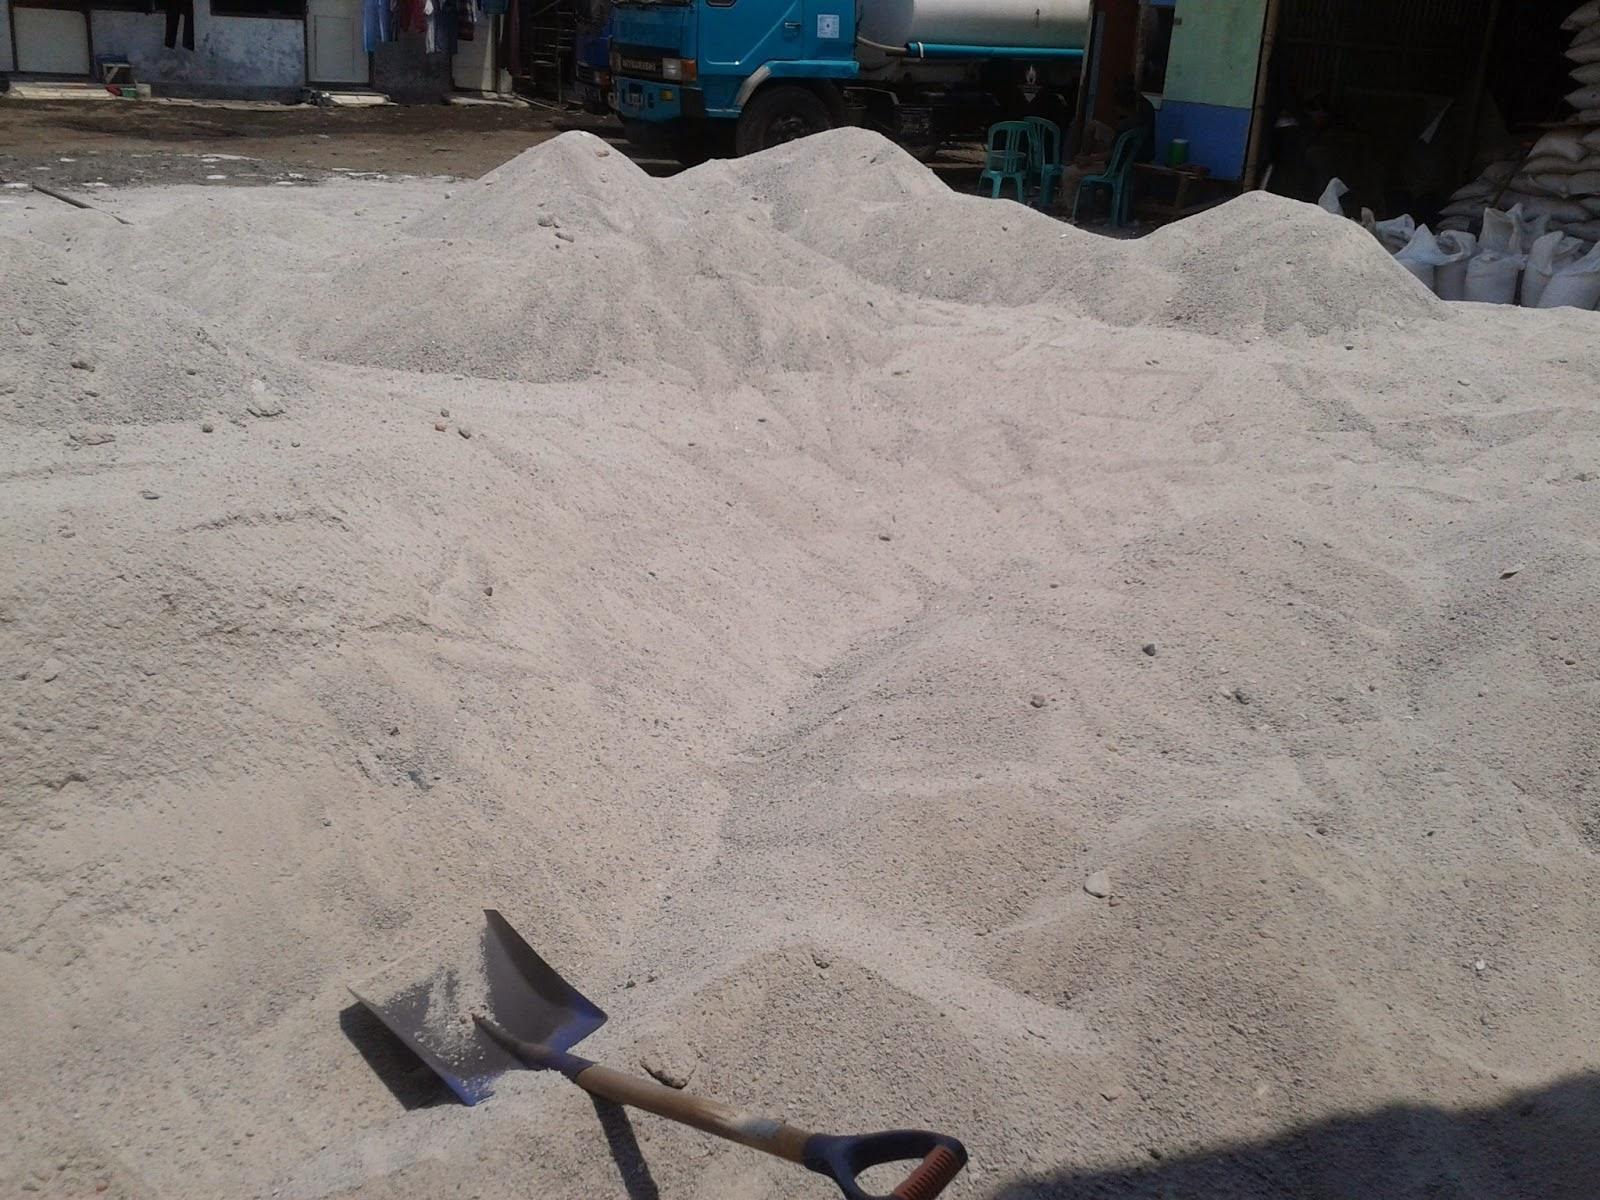 Menjual pasir silika | Pasir Silika Berbagai Ukuran